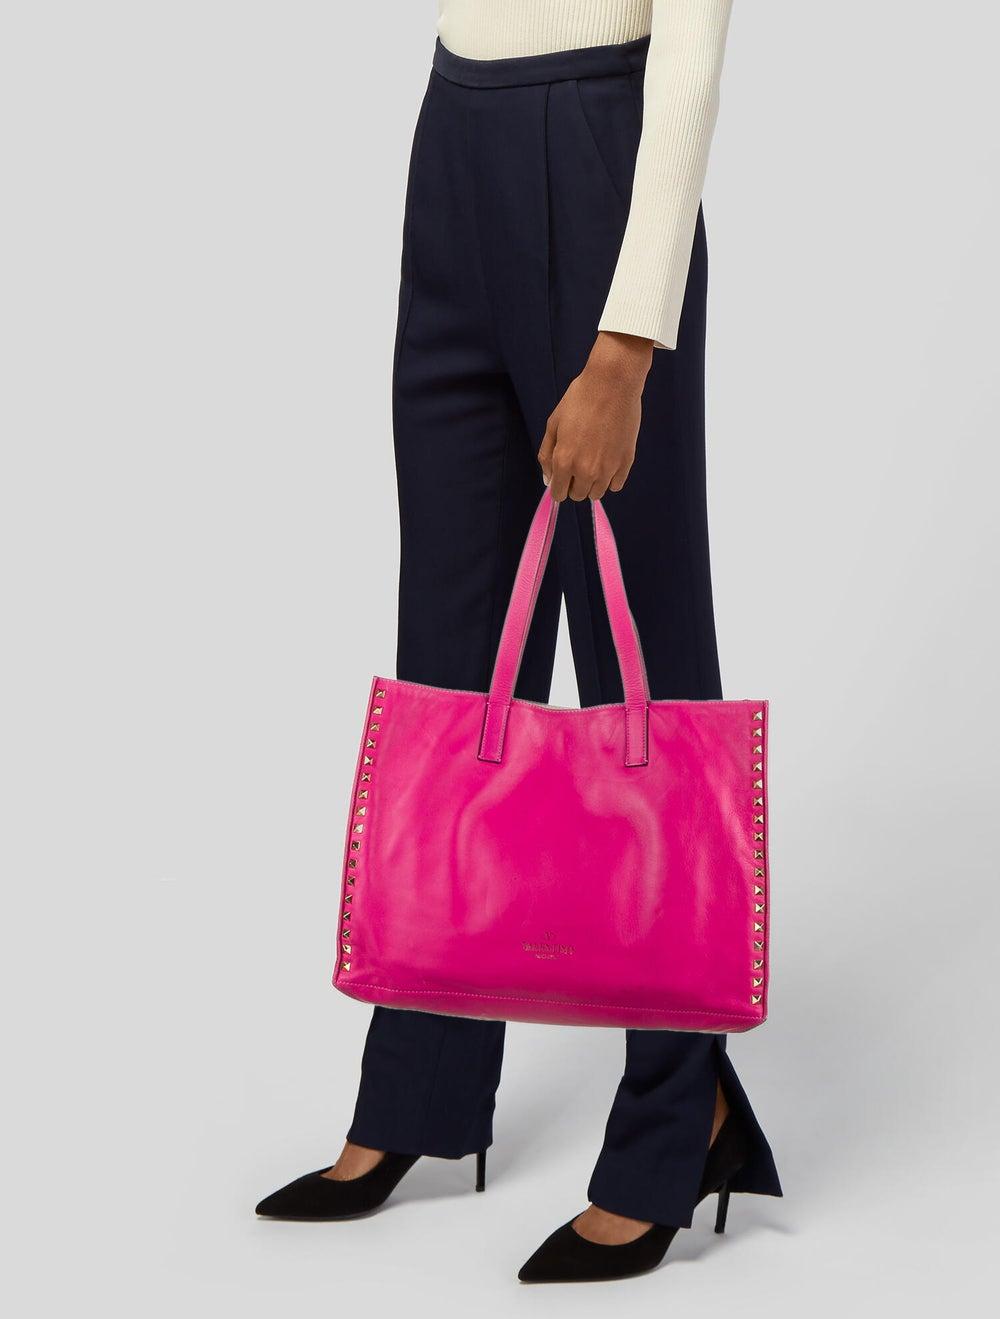 Valentino Rockstud Leather Tote Pink - image 2